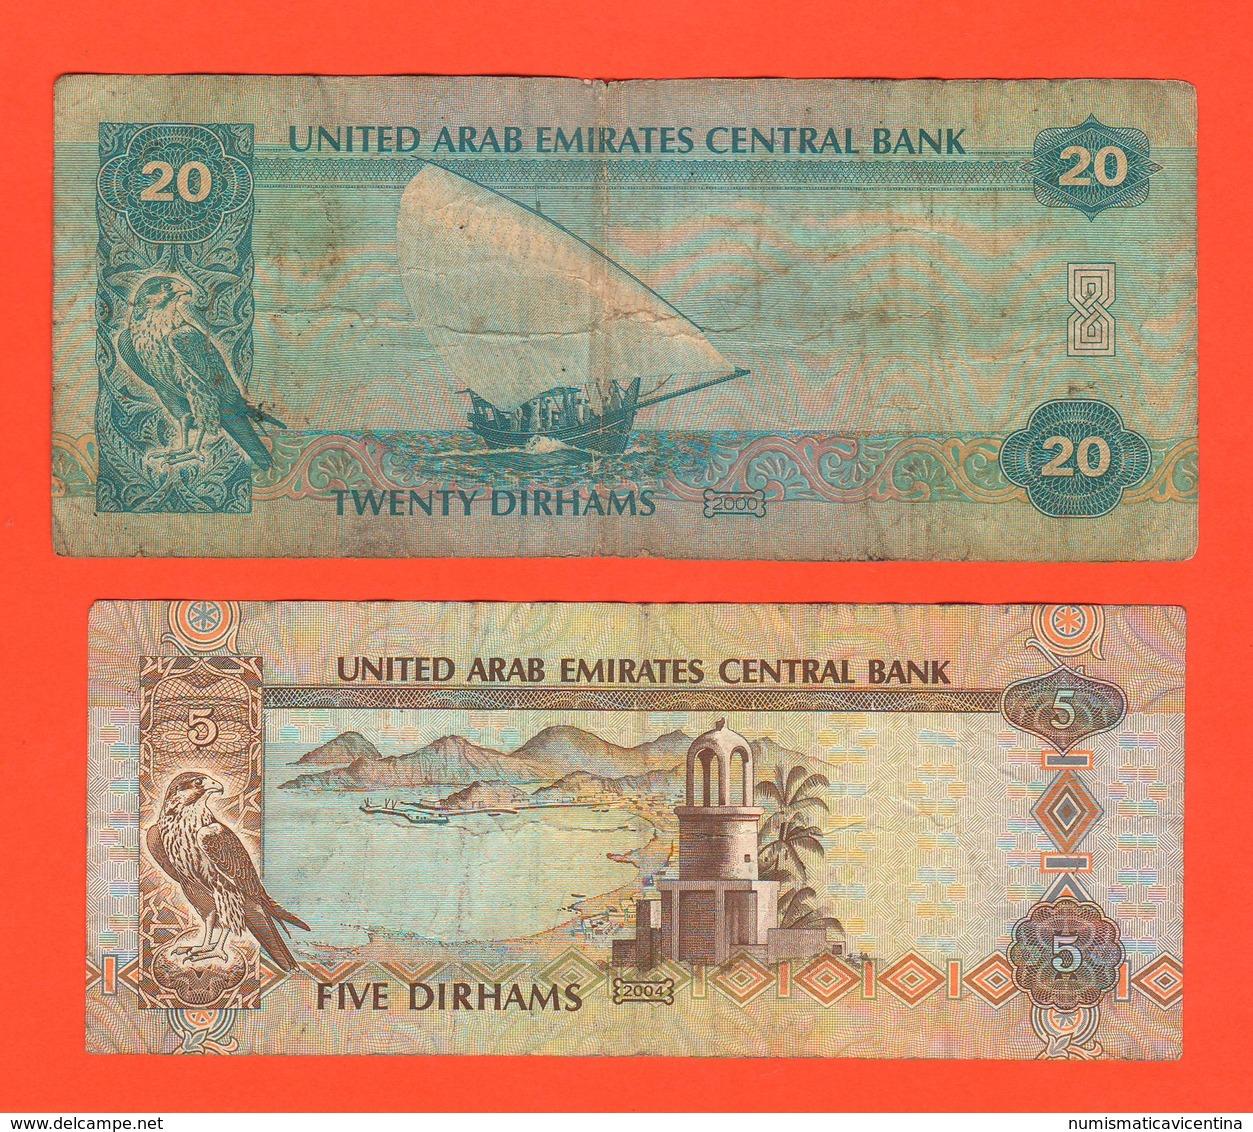 Arabia Saudita United Arab Emirates 5 + 10 + 20 Dirhams - Ver. Arab. Emirate